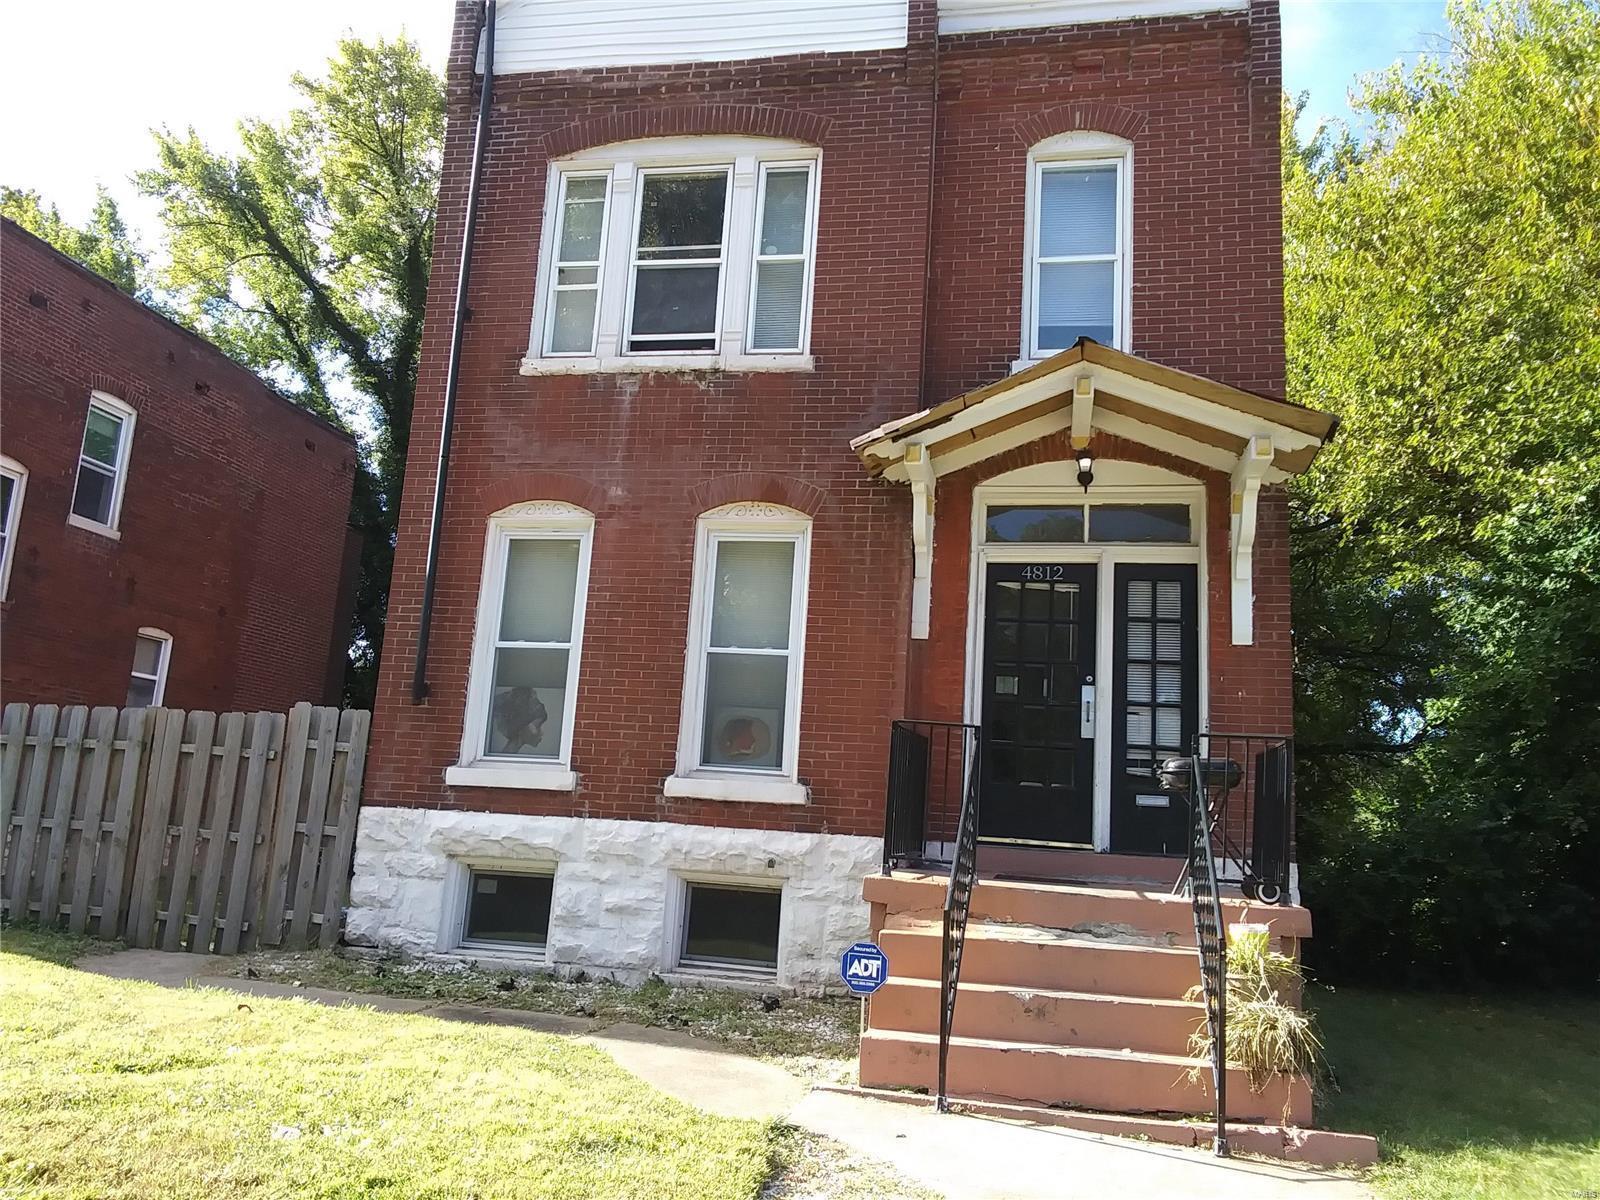 4812 Cote Brilliante Avenue Property Photo - St Louis, MO real estate listing